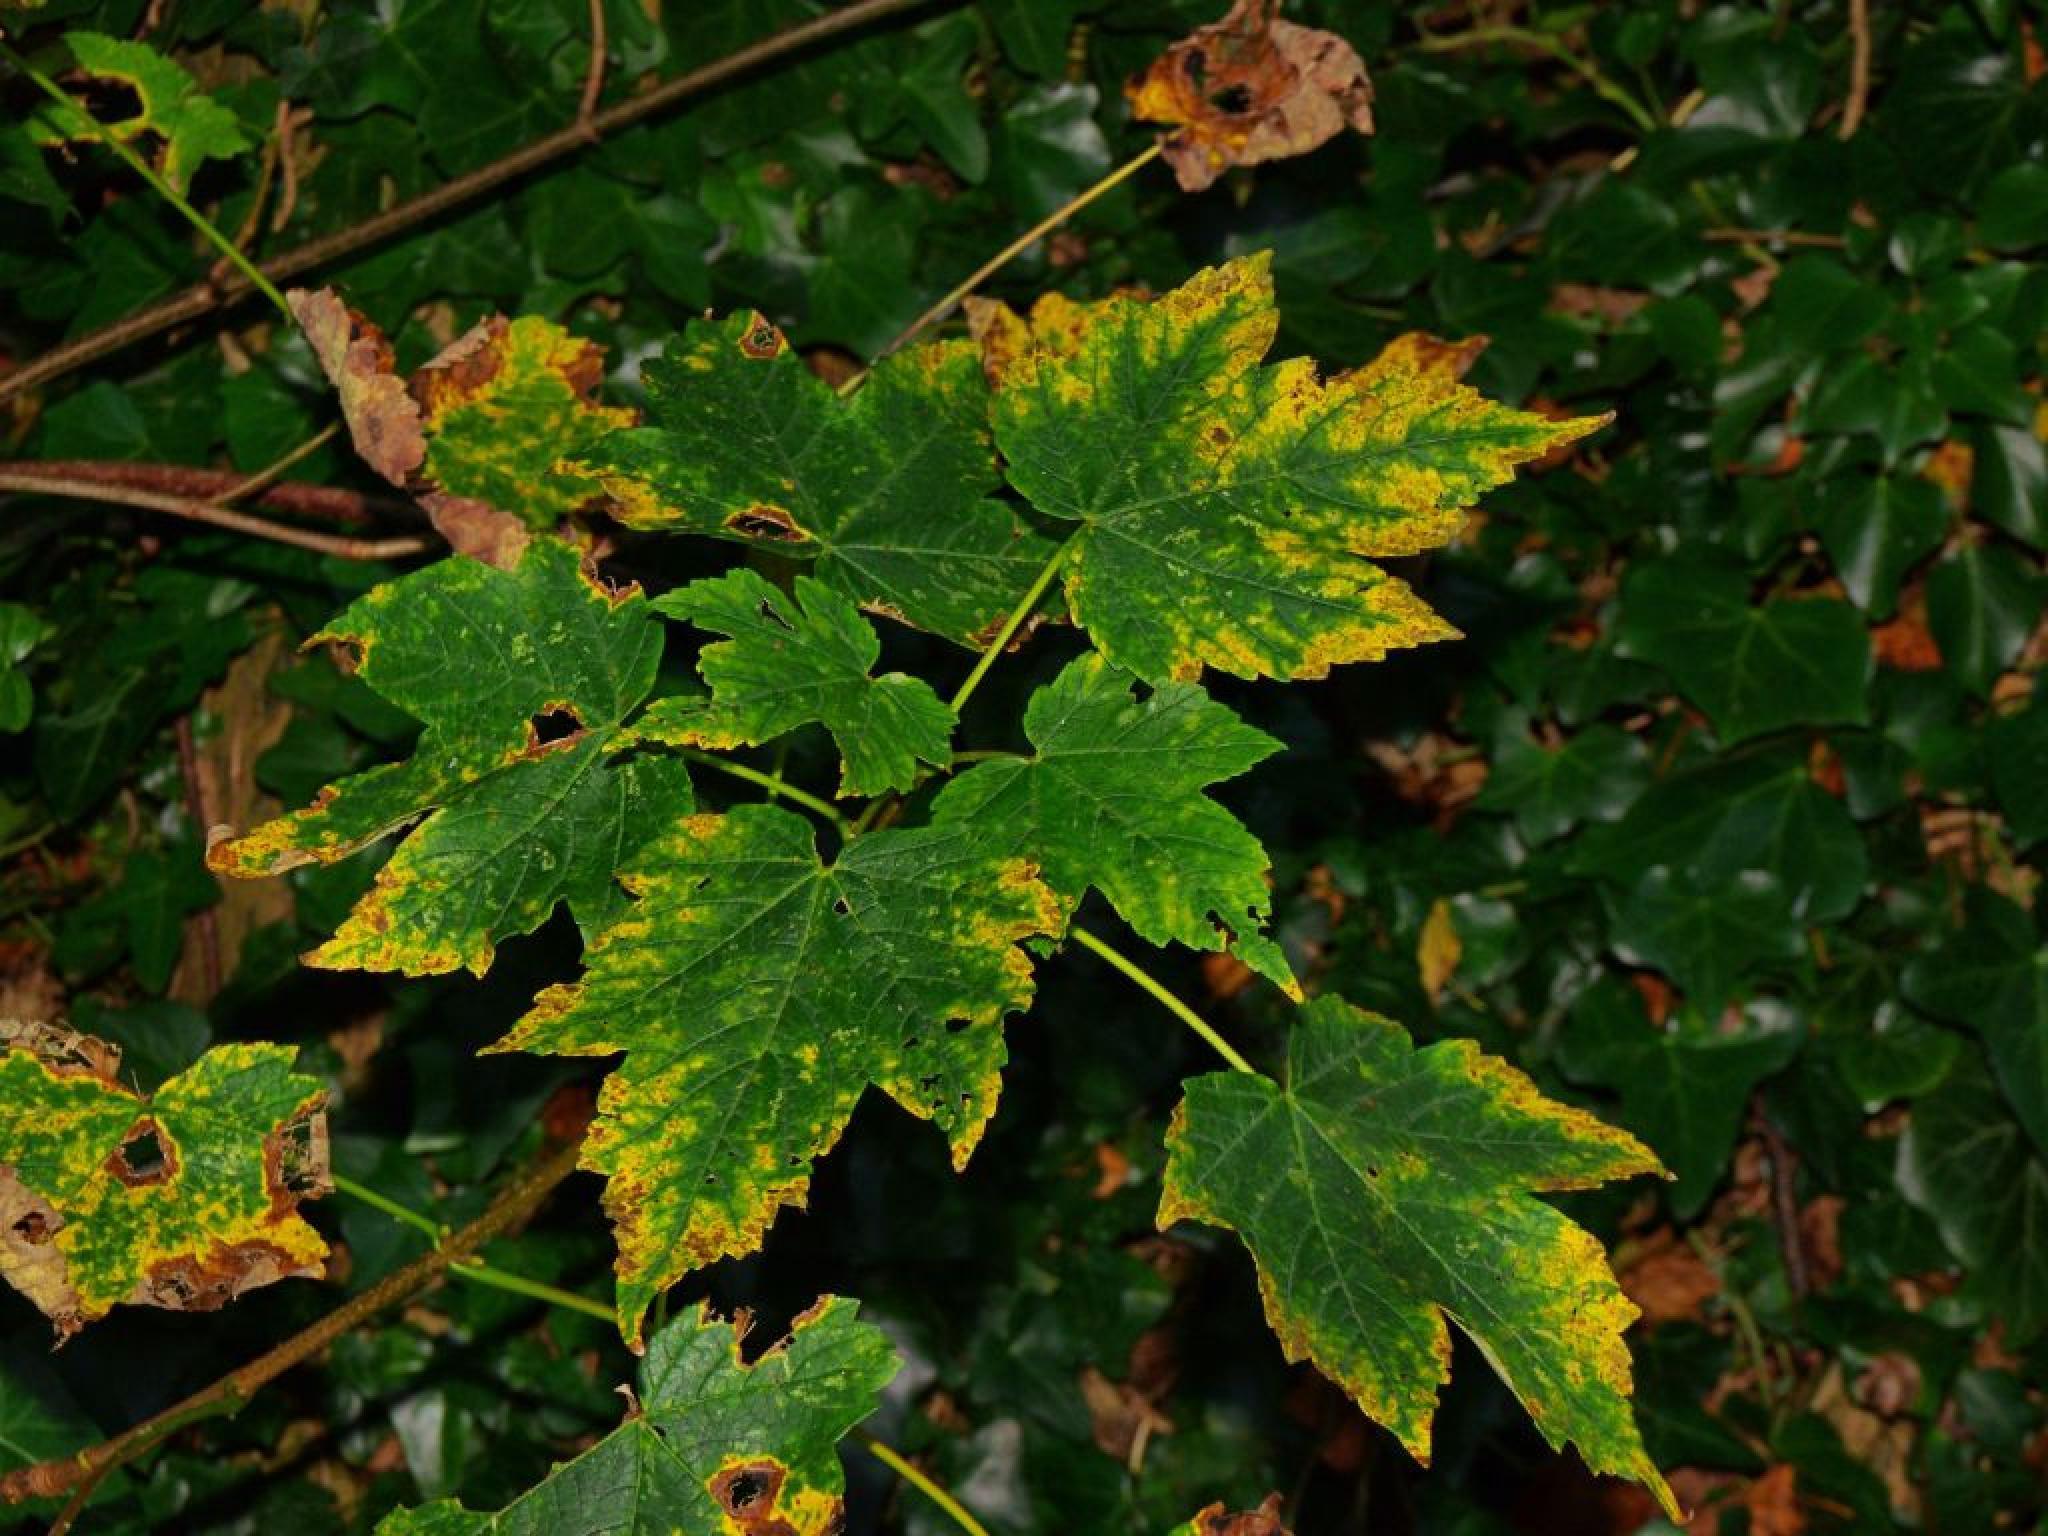 Autumn leaves by David Stewart